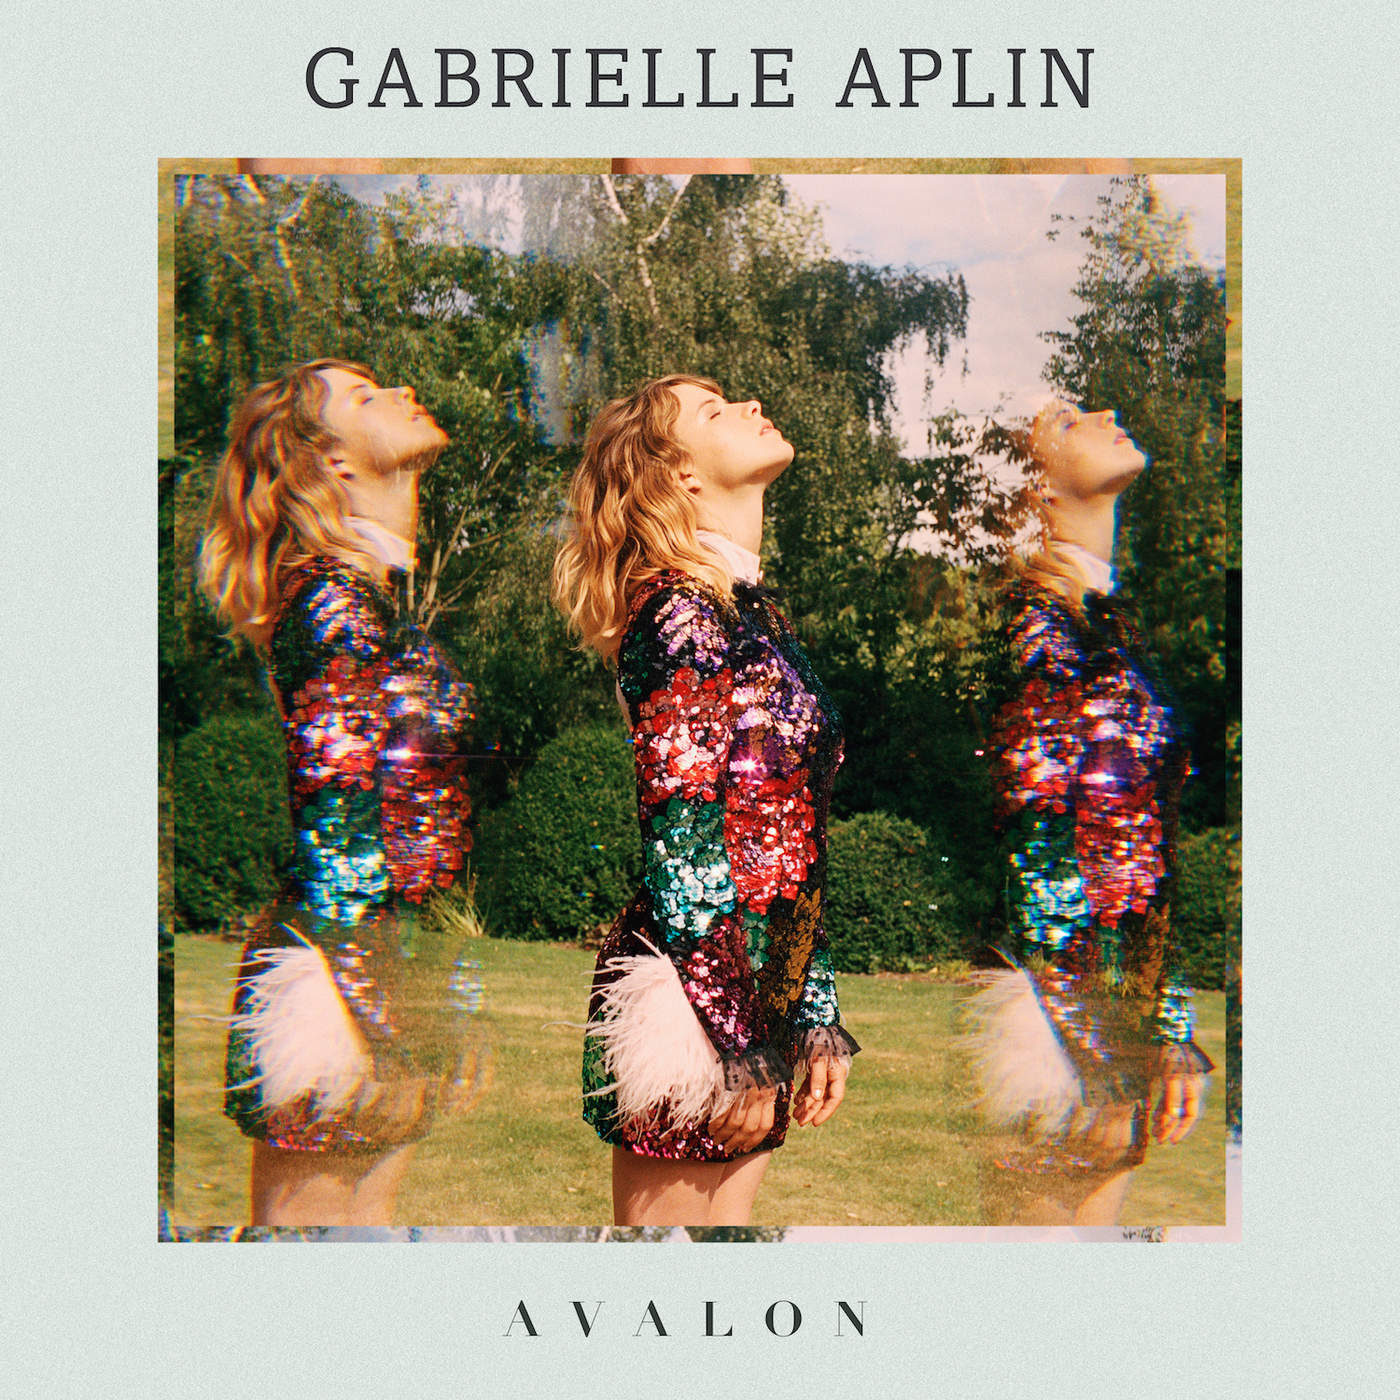 Gabrielle Aplin - Waking Up Slow (Piano) - Single